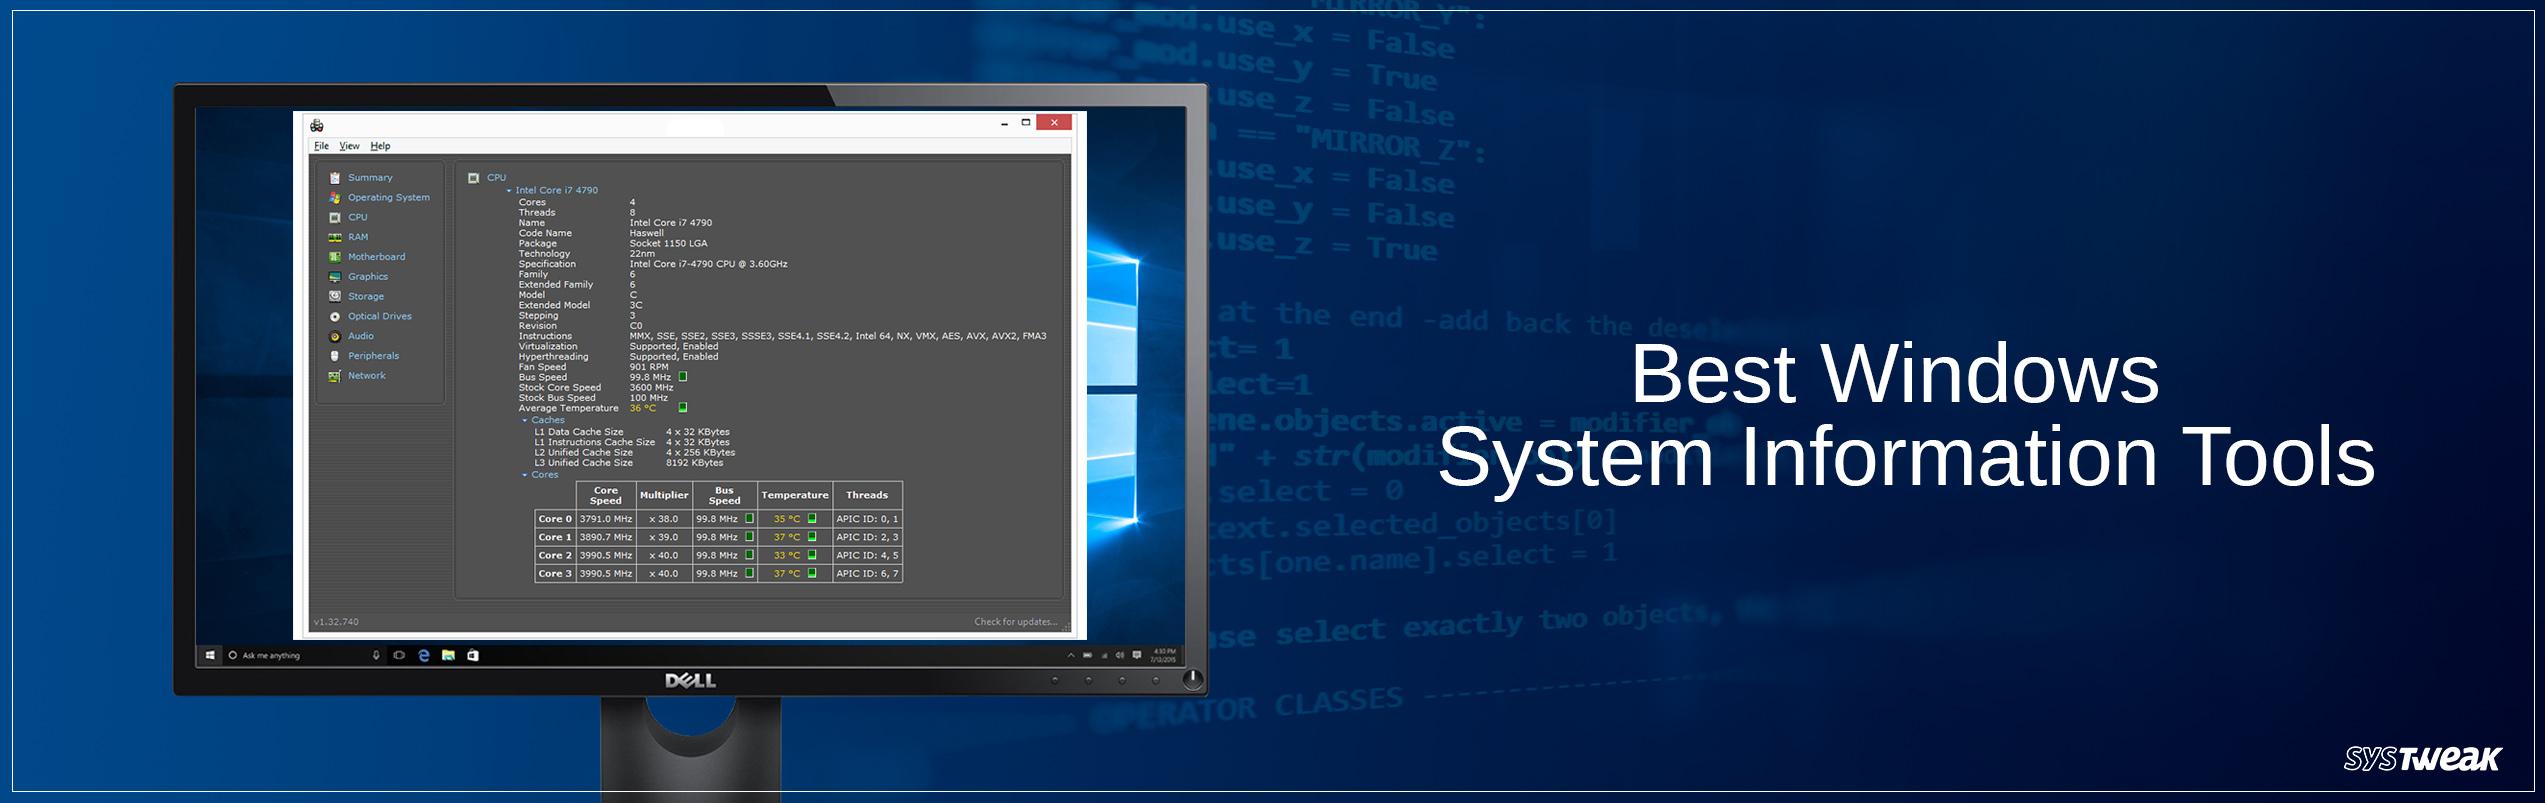 10 Best Windows System Information Tools